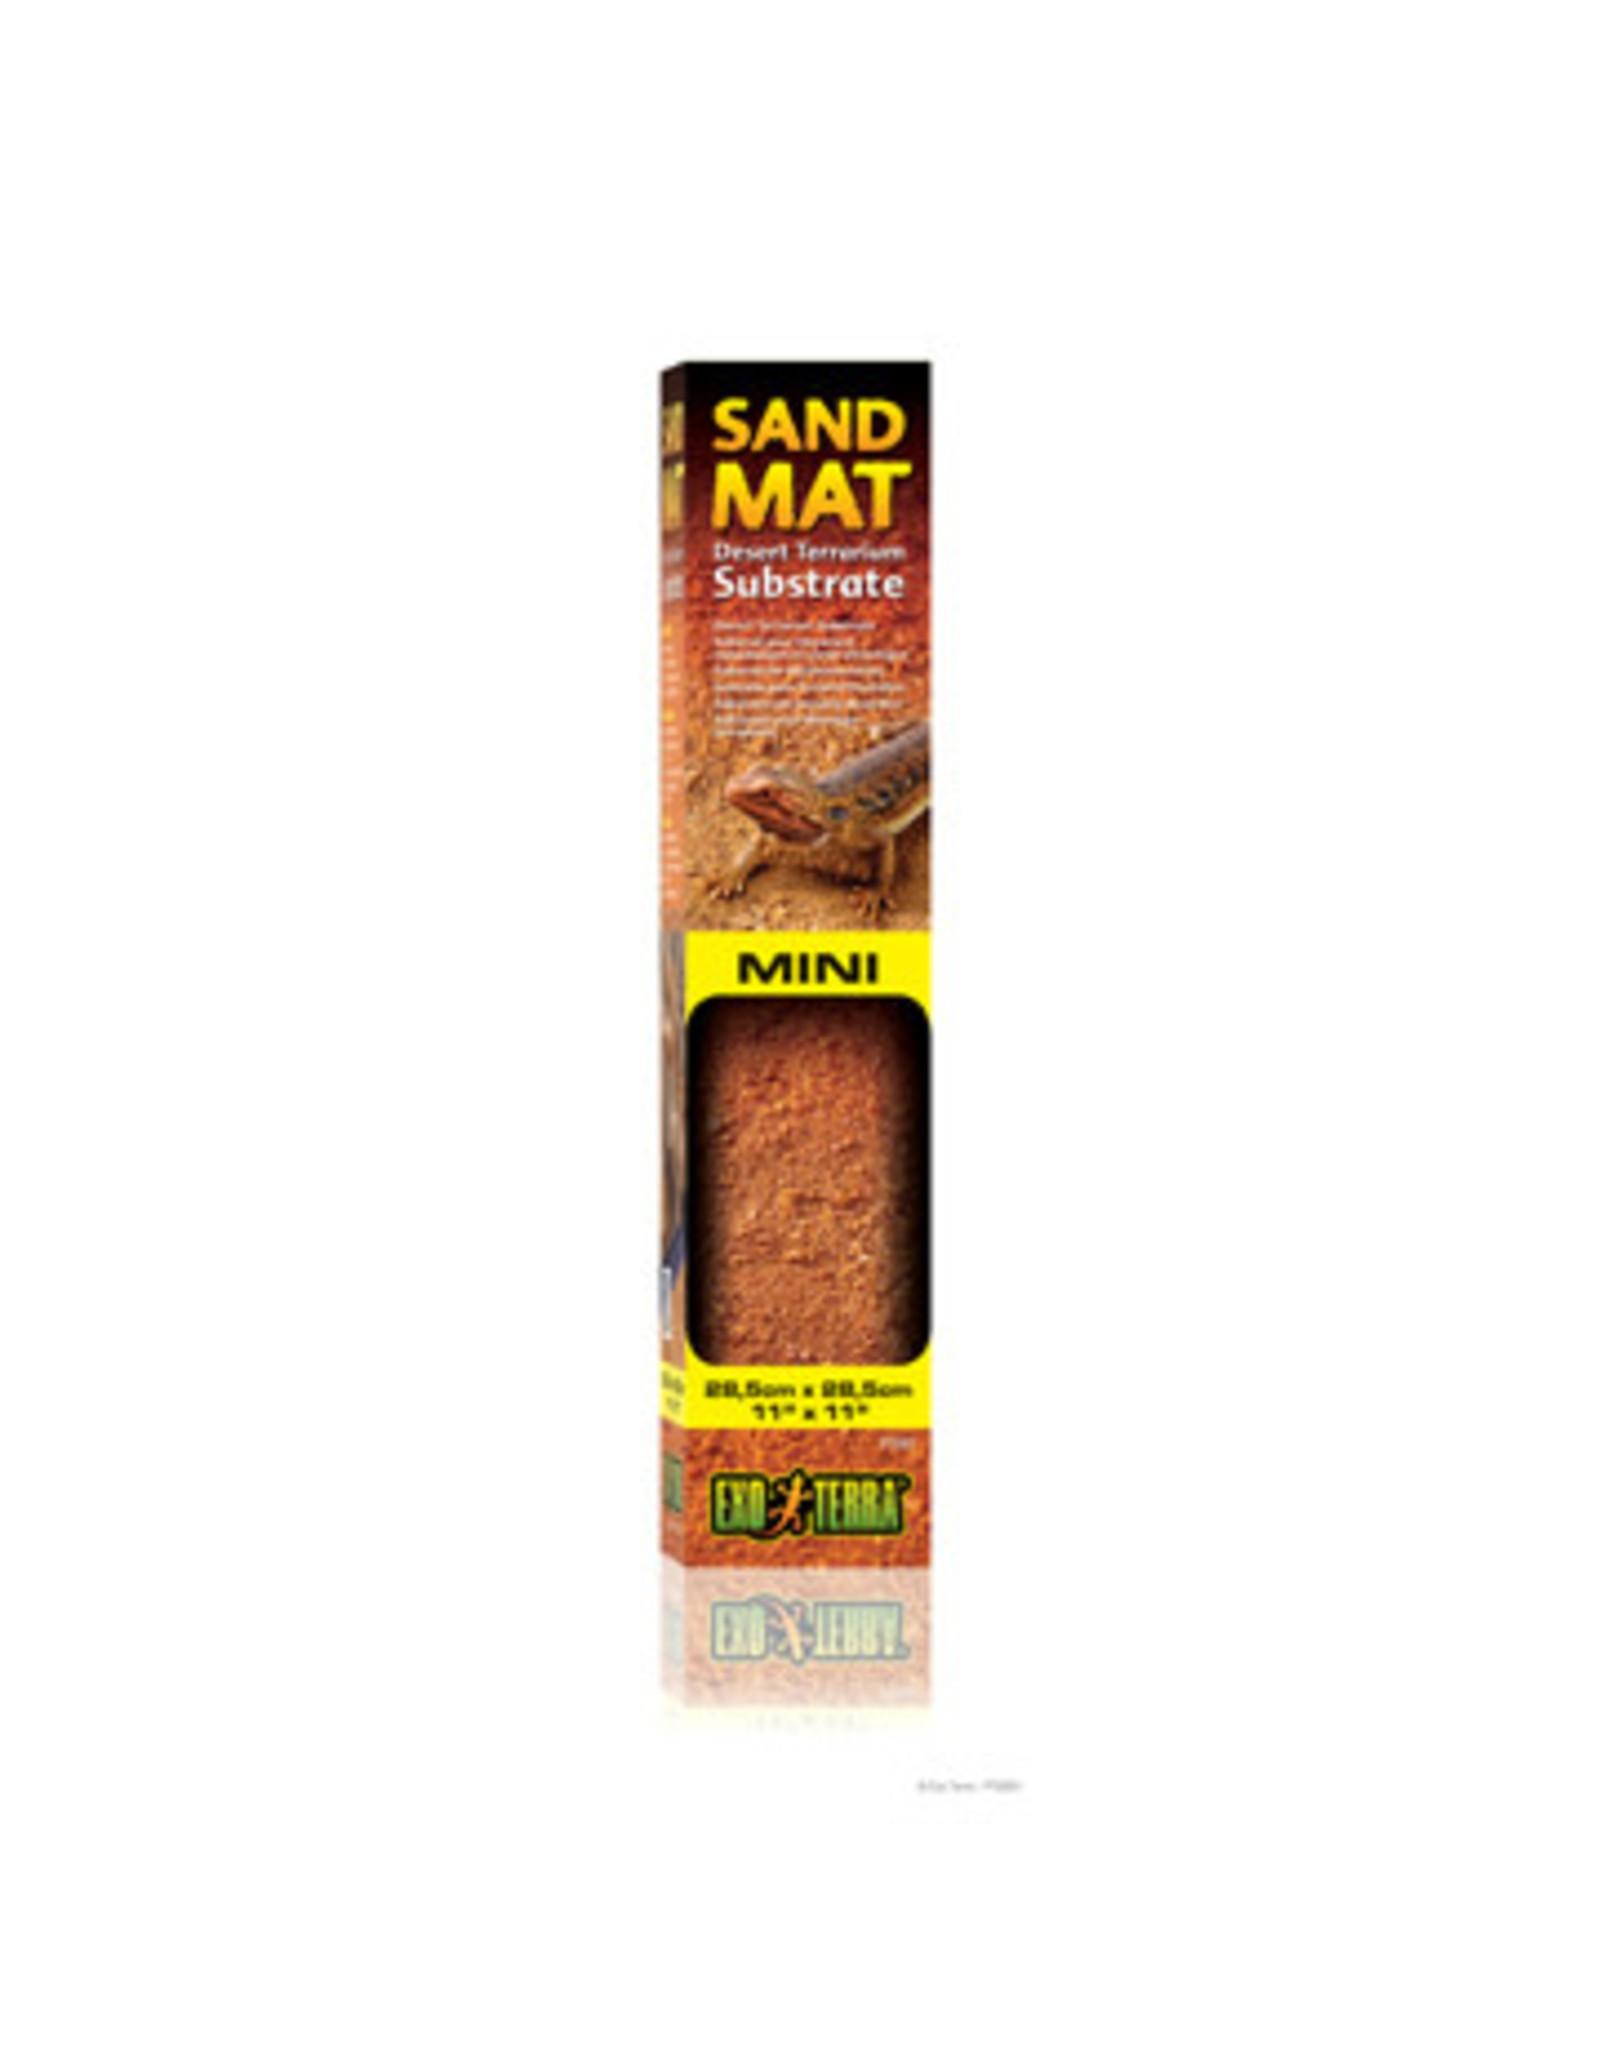 Exo Terra Sand Mat Mini - Desert Terrarium Substrate - 28.5 x 29 cm